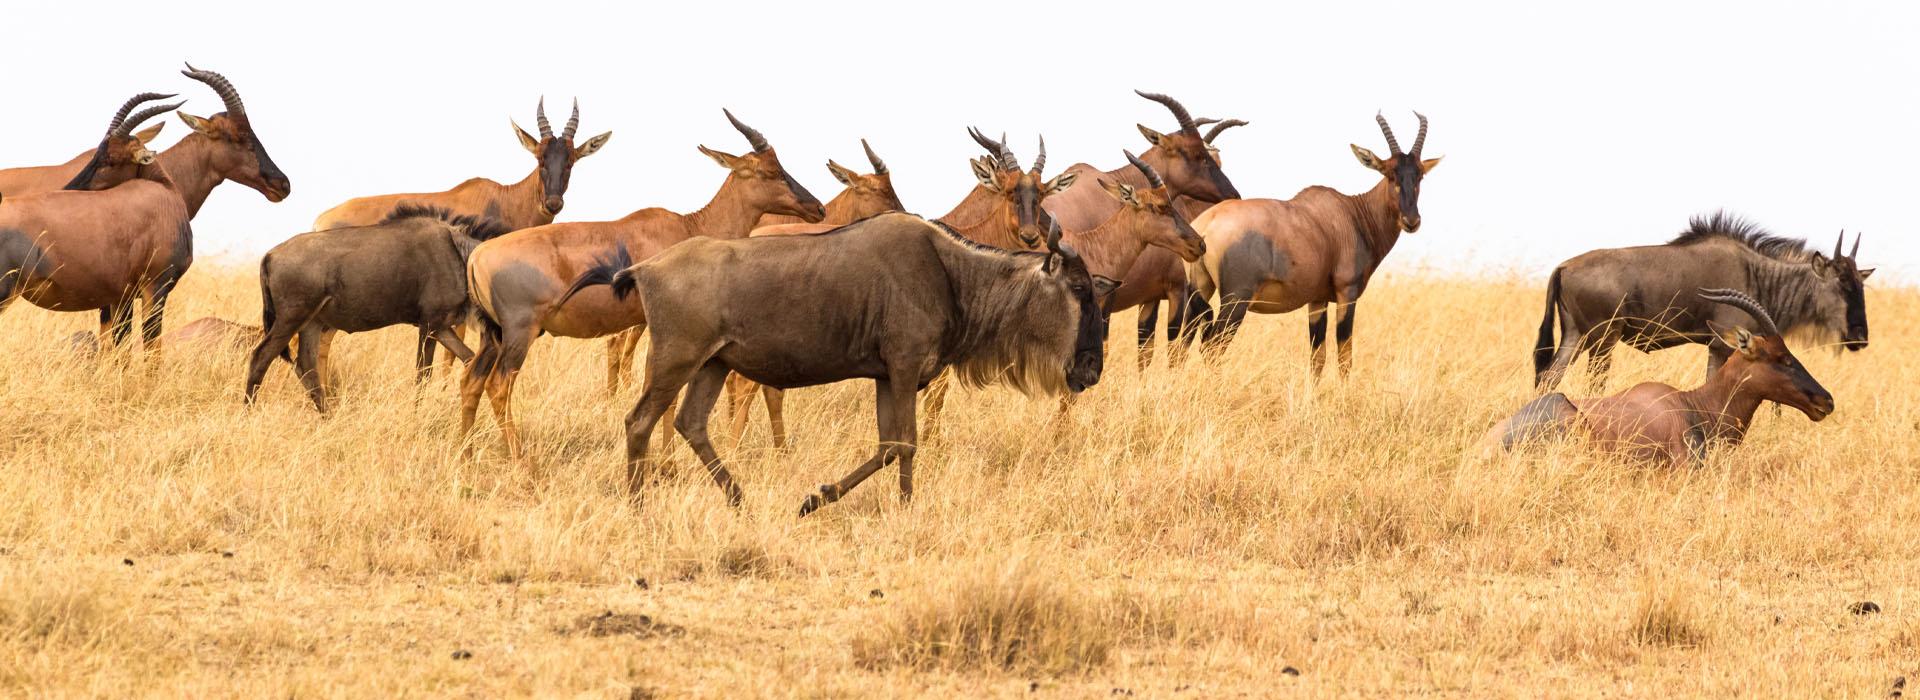 Migration Safaris - African Adventure Safaris